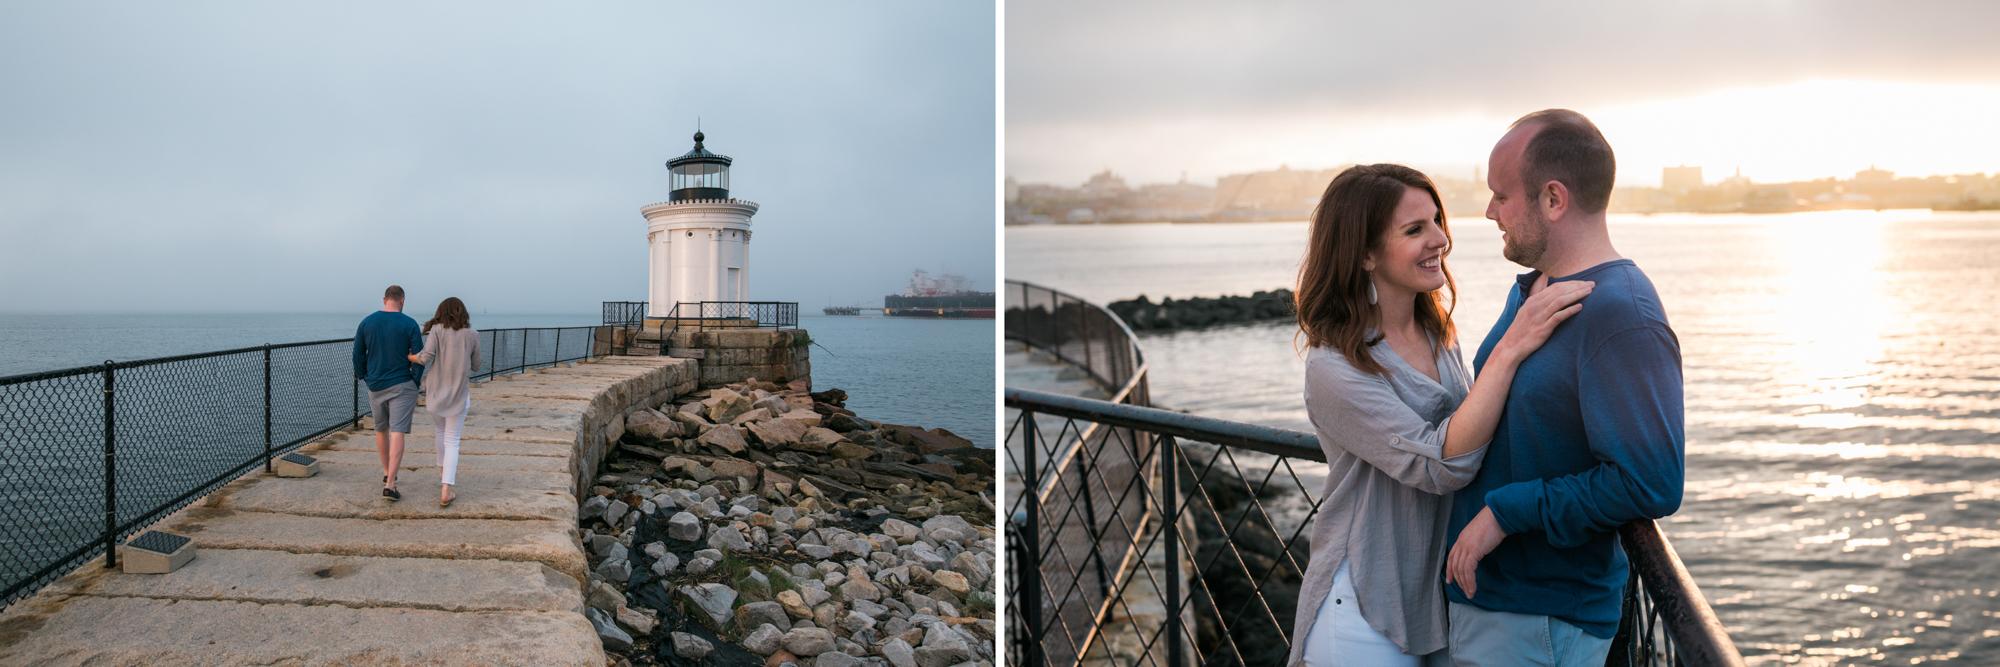 LFA_JaclynAndrew_Portland_Maine_Engagement_shoot-0007.jpg